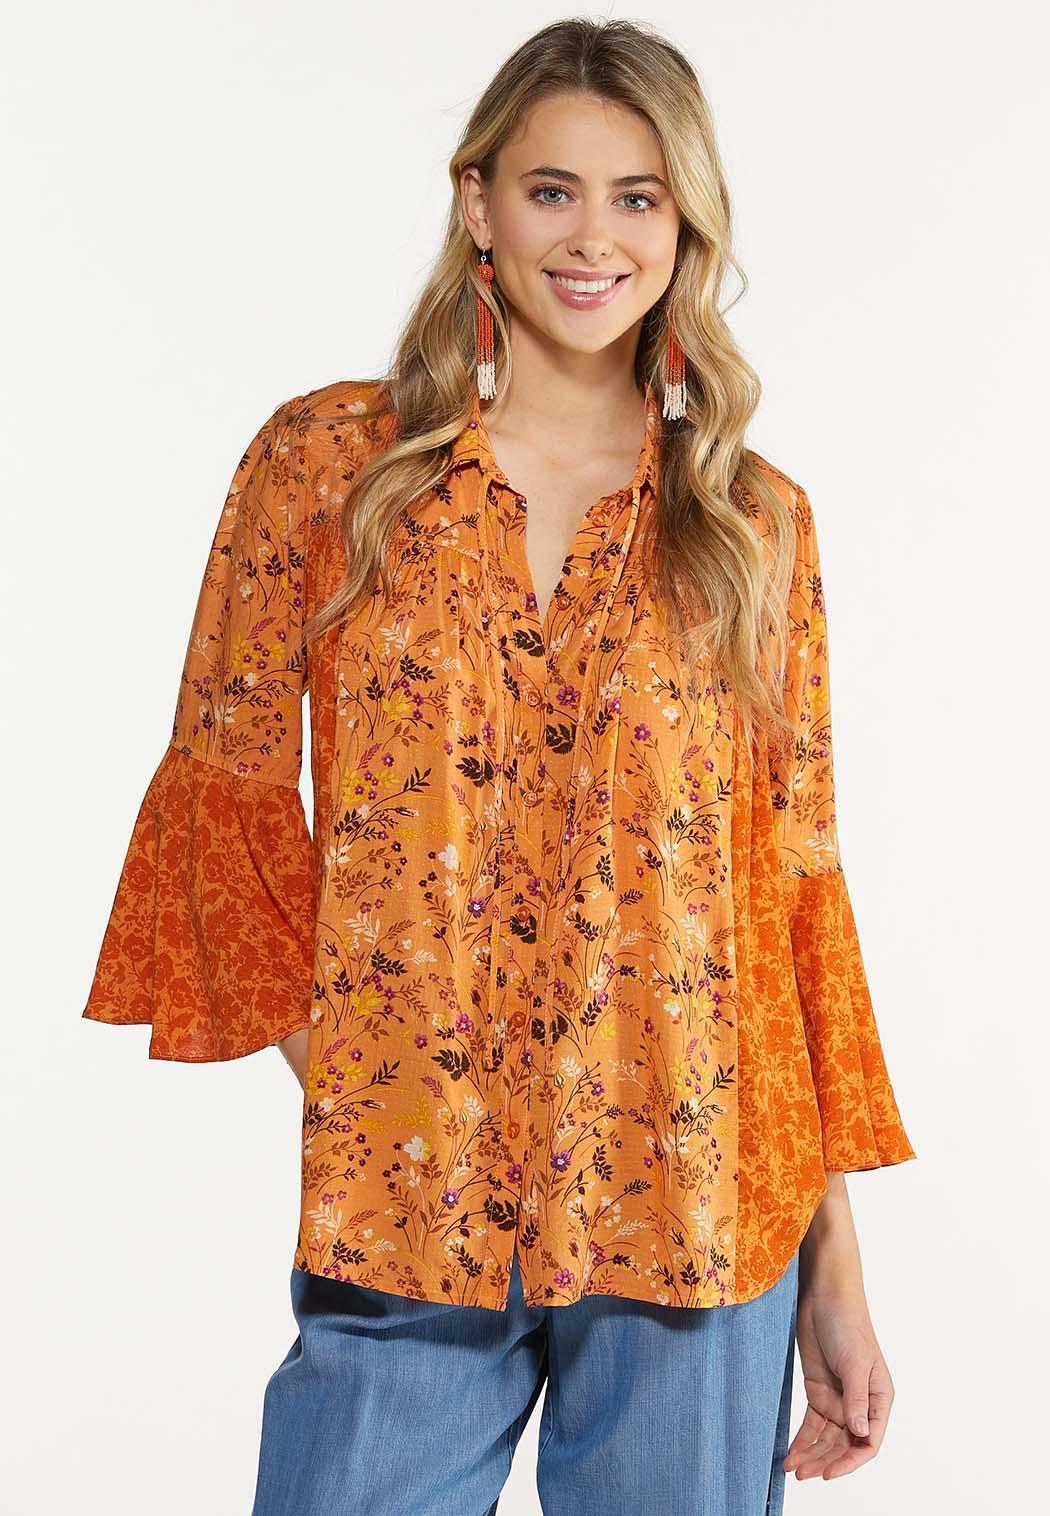 Orange Floral Poet Top